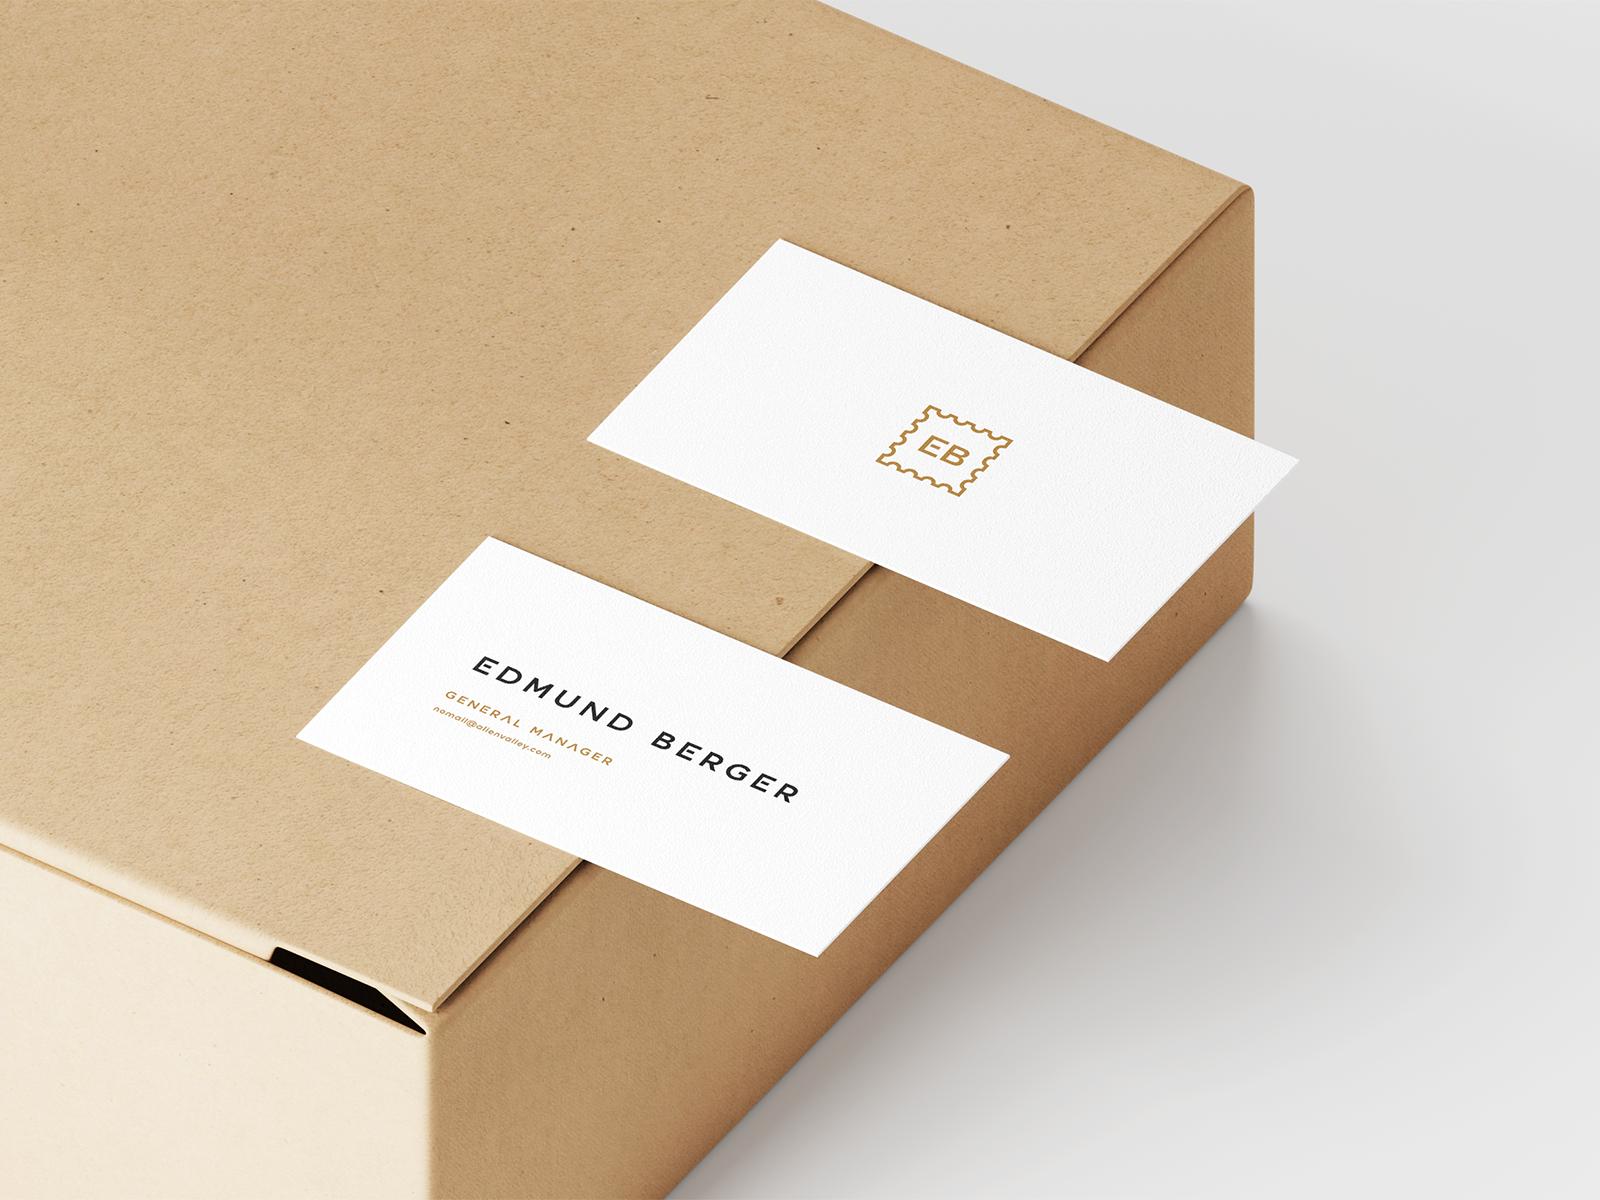 Download Freebie Business Card On Box Mockup Box Mockup Download Business Card Free Business Cards